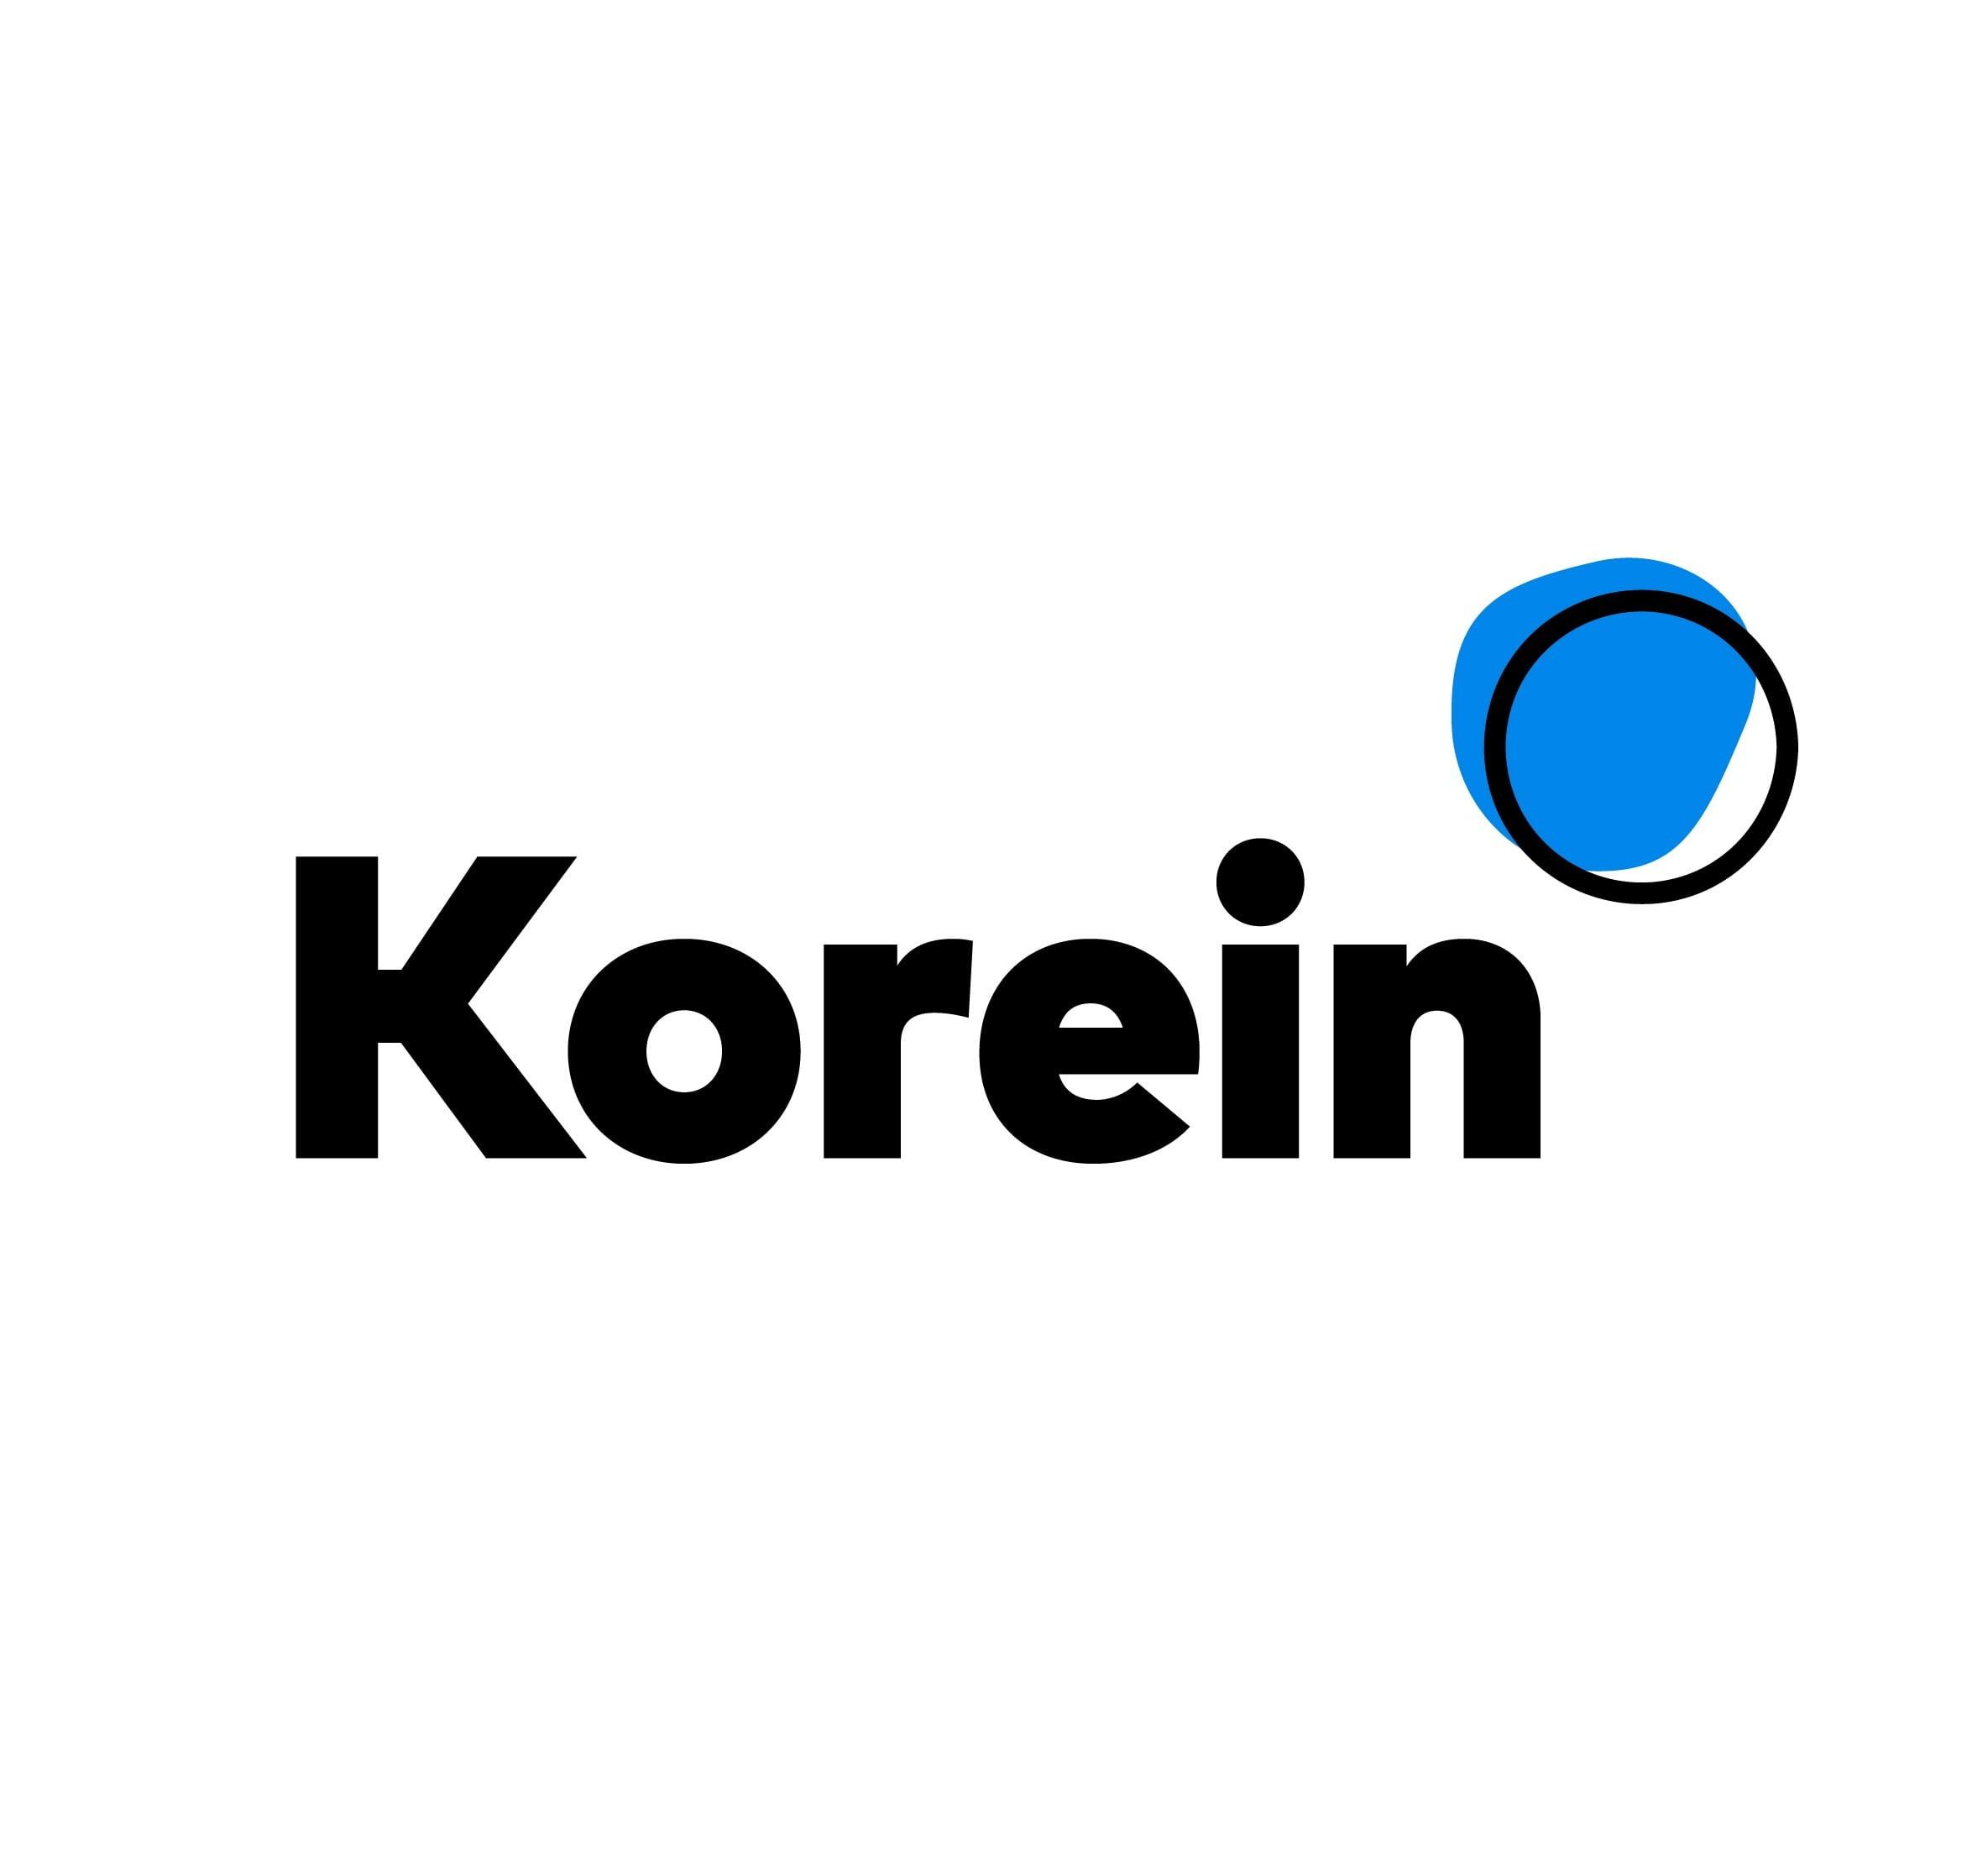 korein logo vierkant 1